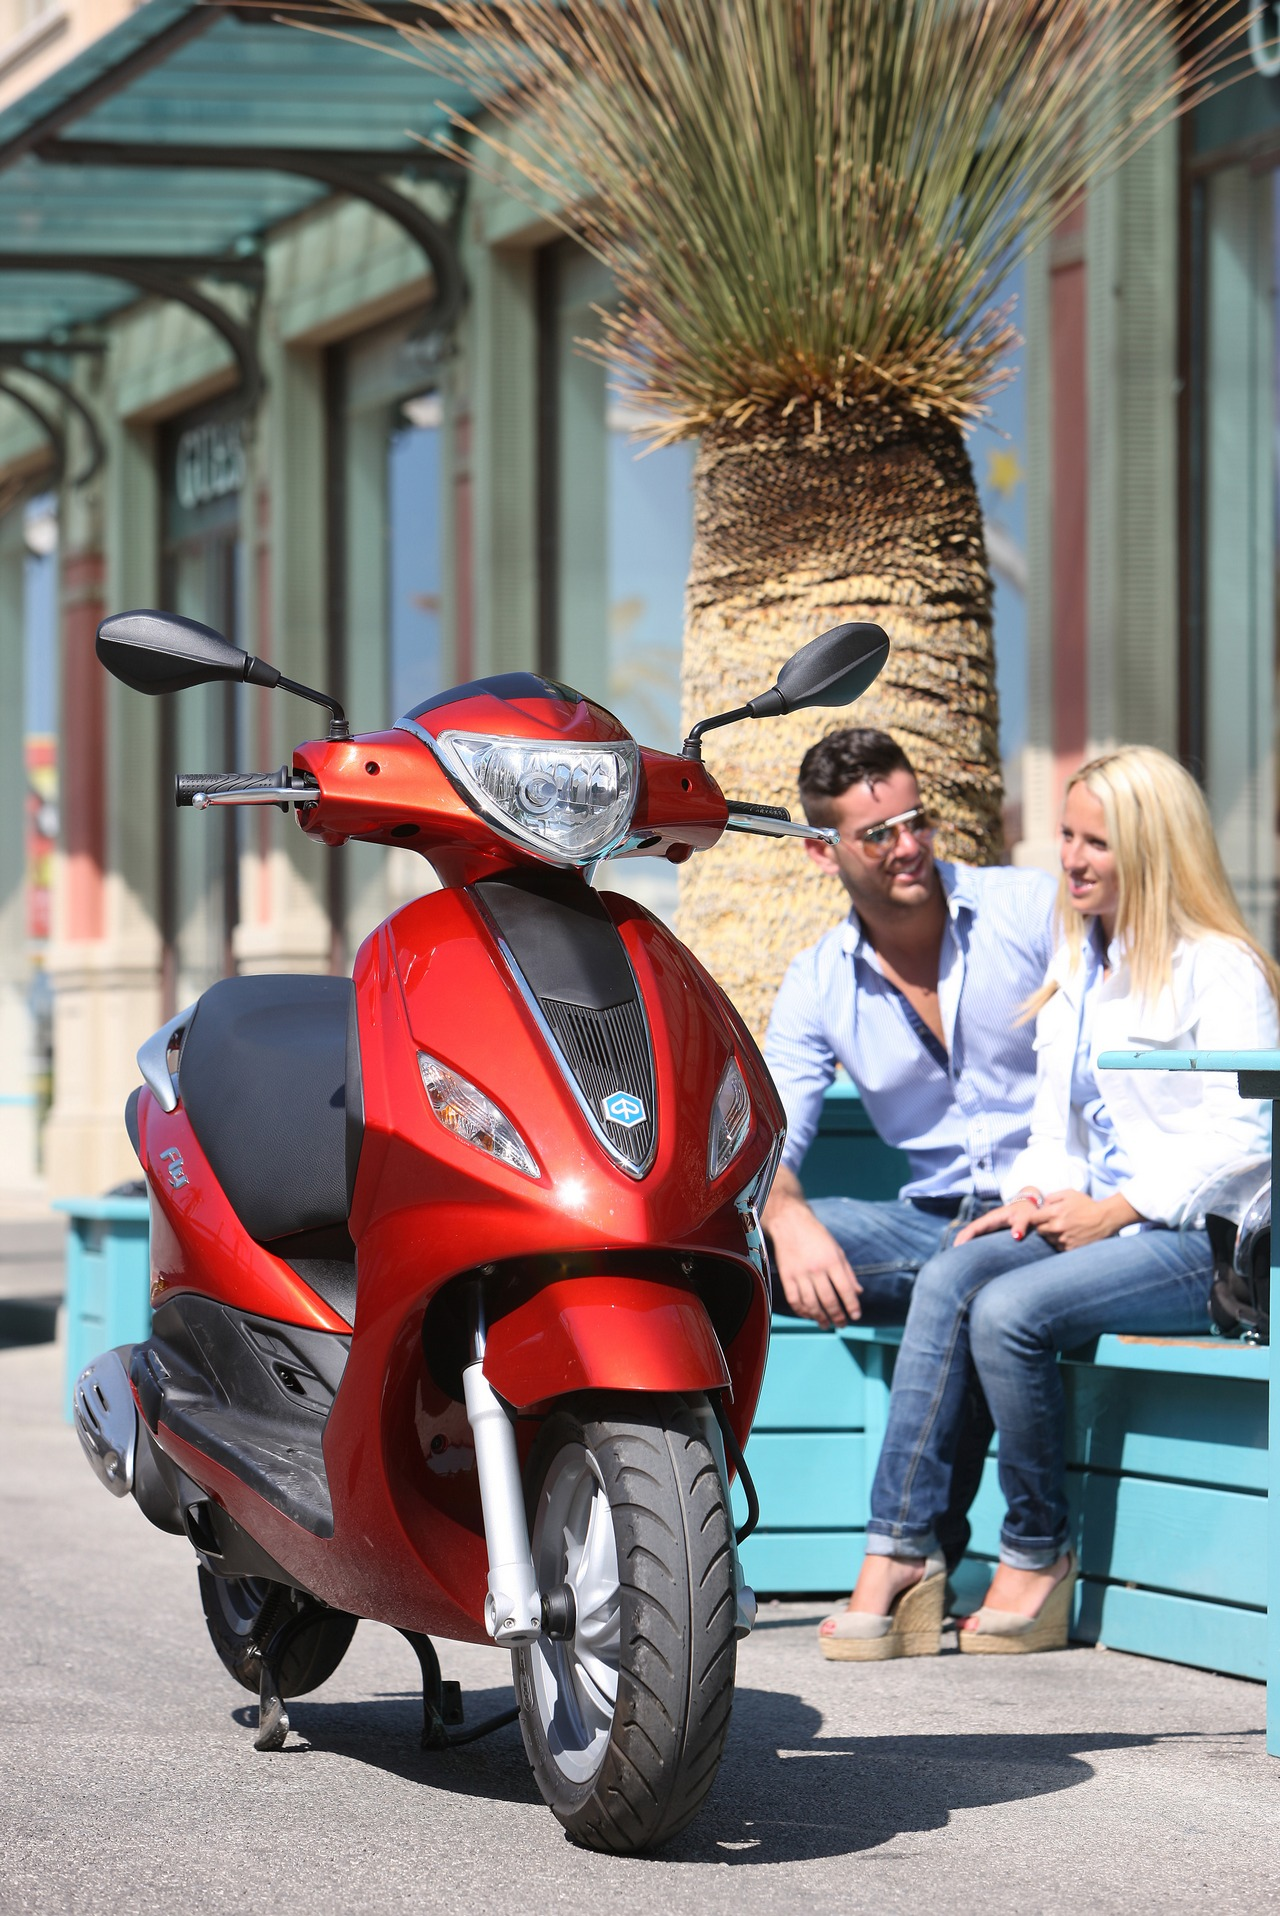 Piaggio Fly - EICMA 2012